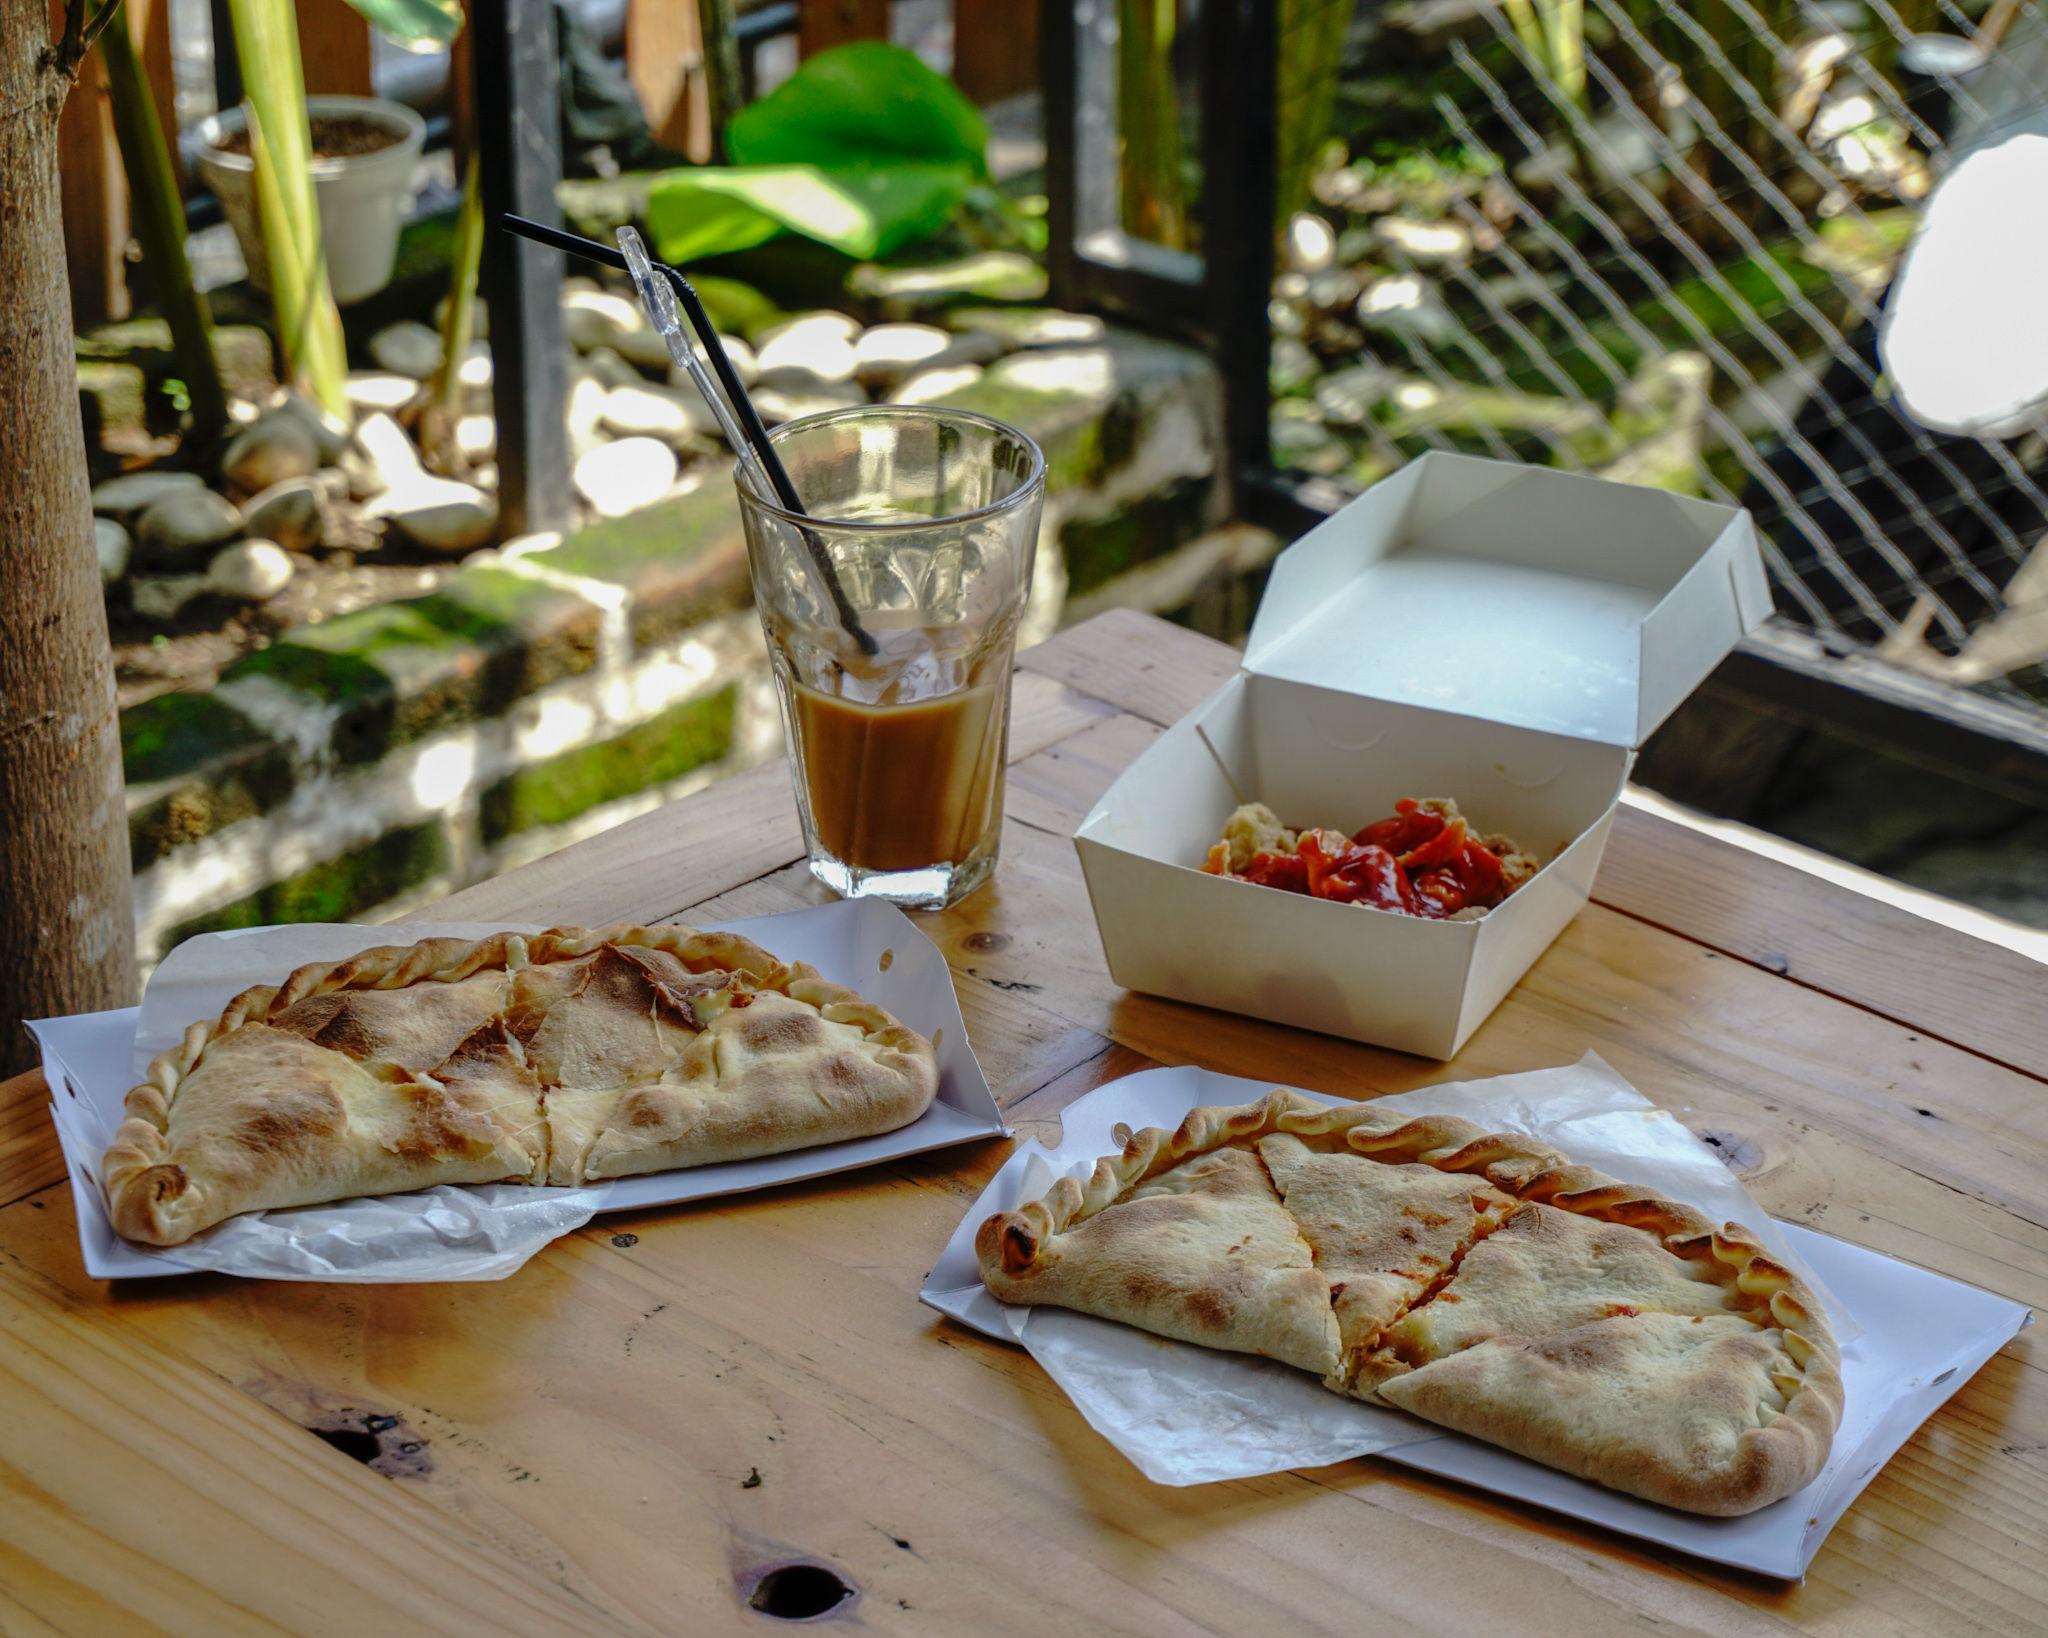 Cobain Makanan Unik ala Calzone Express di Yogyakarta